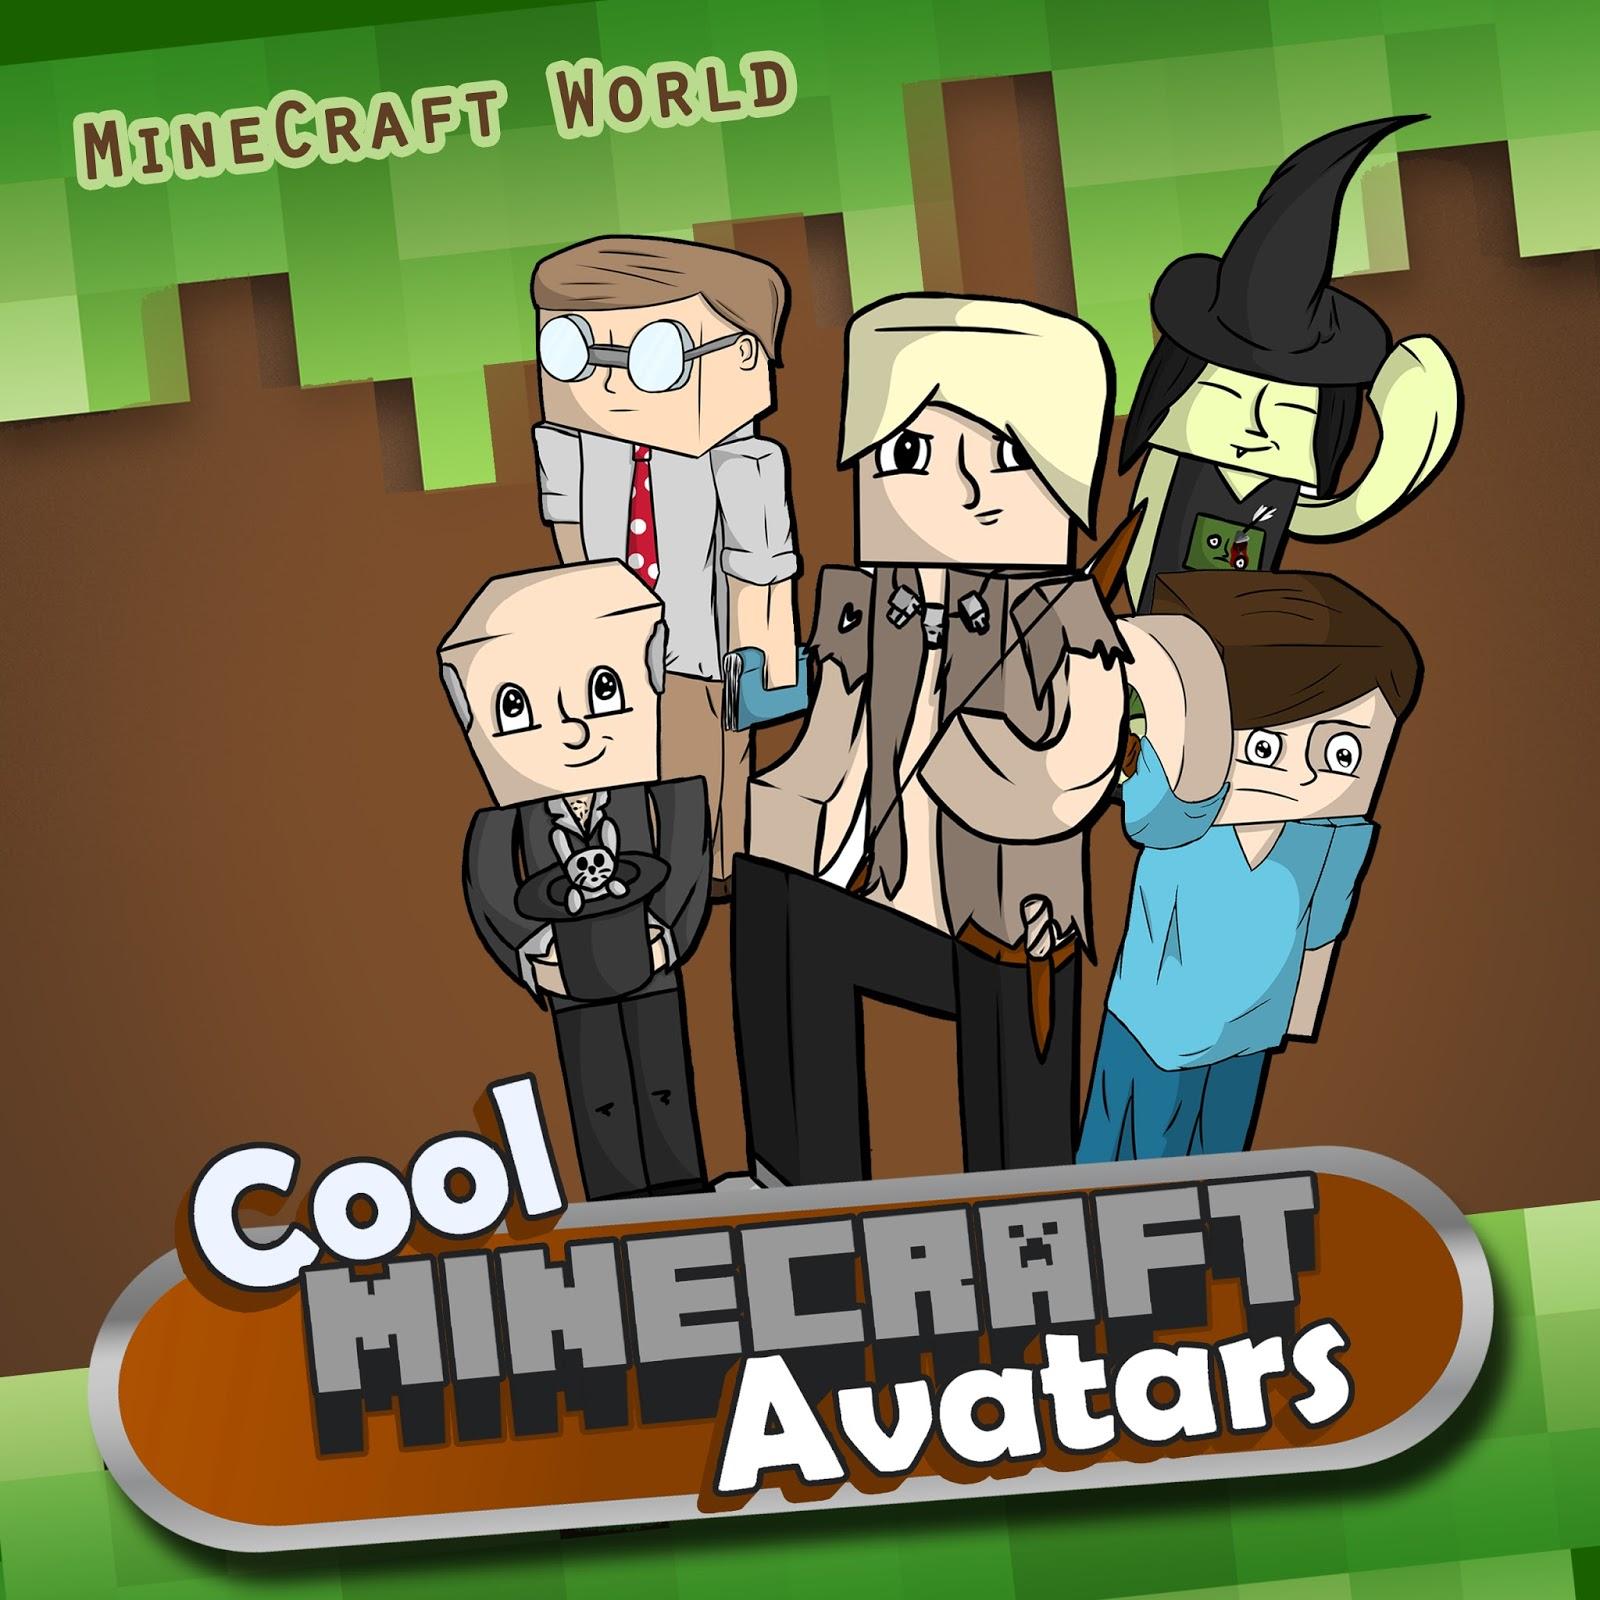 Cool Avatars: Mygreatfinds: Cool Minecraft Avatars Ebook Review